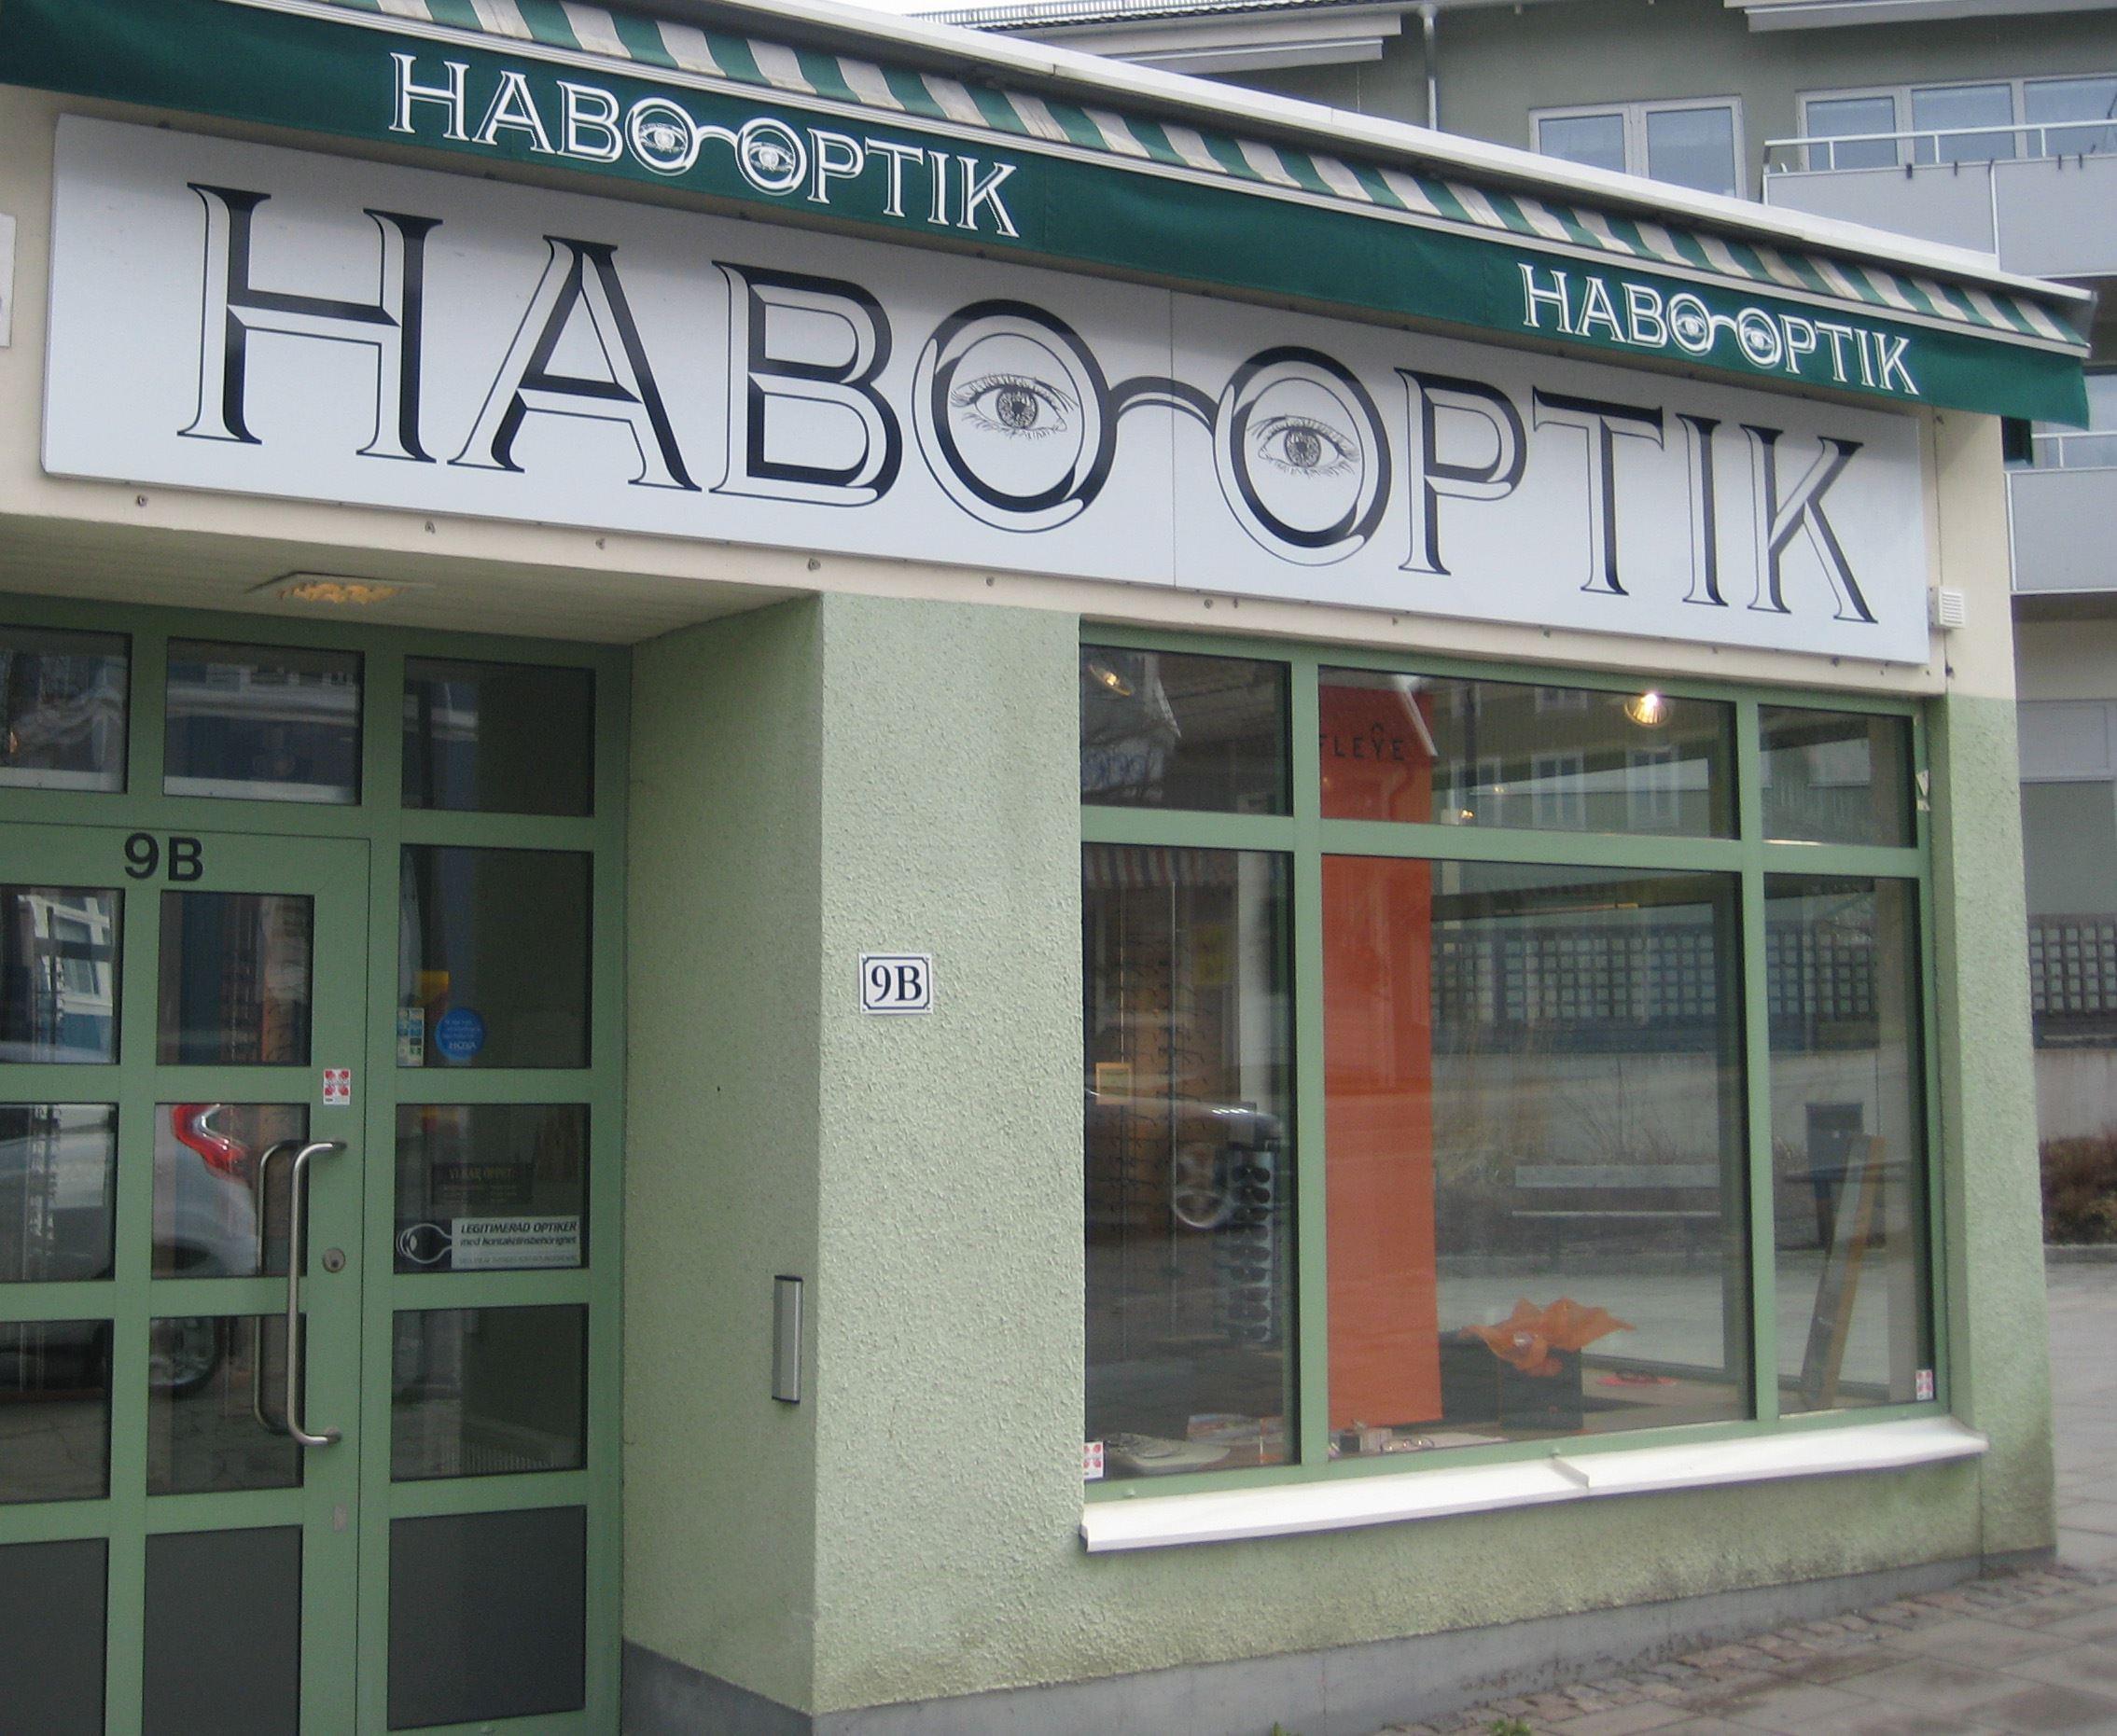 Habo Optik AB